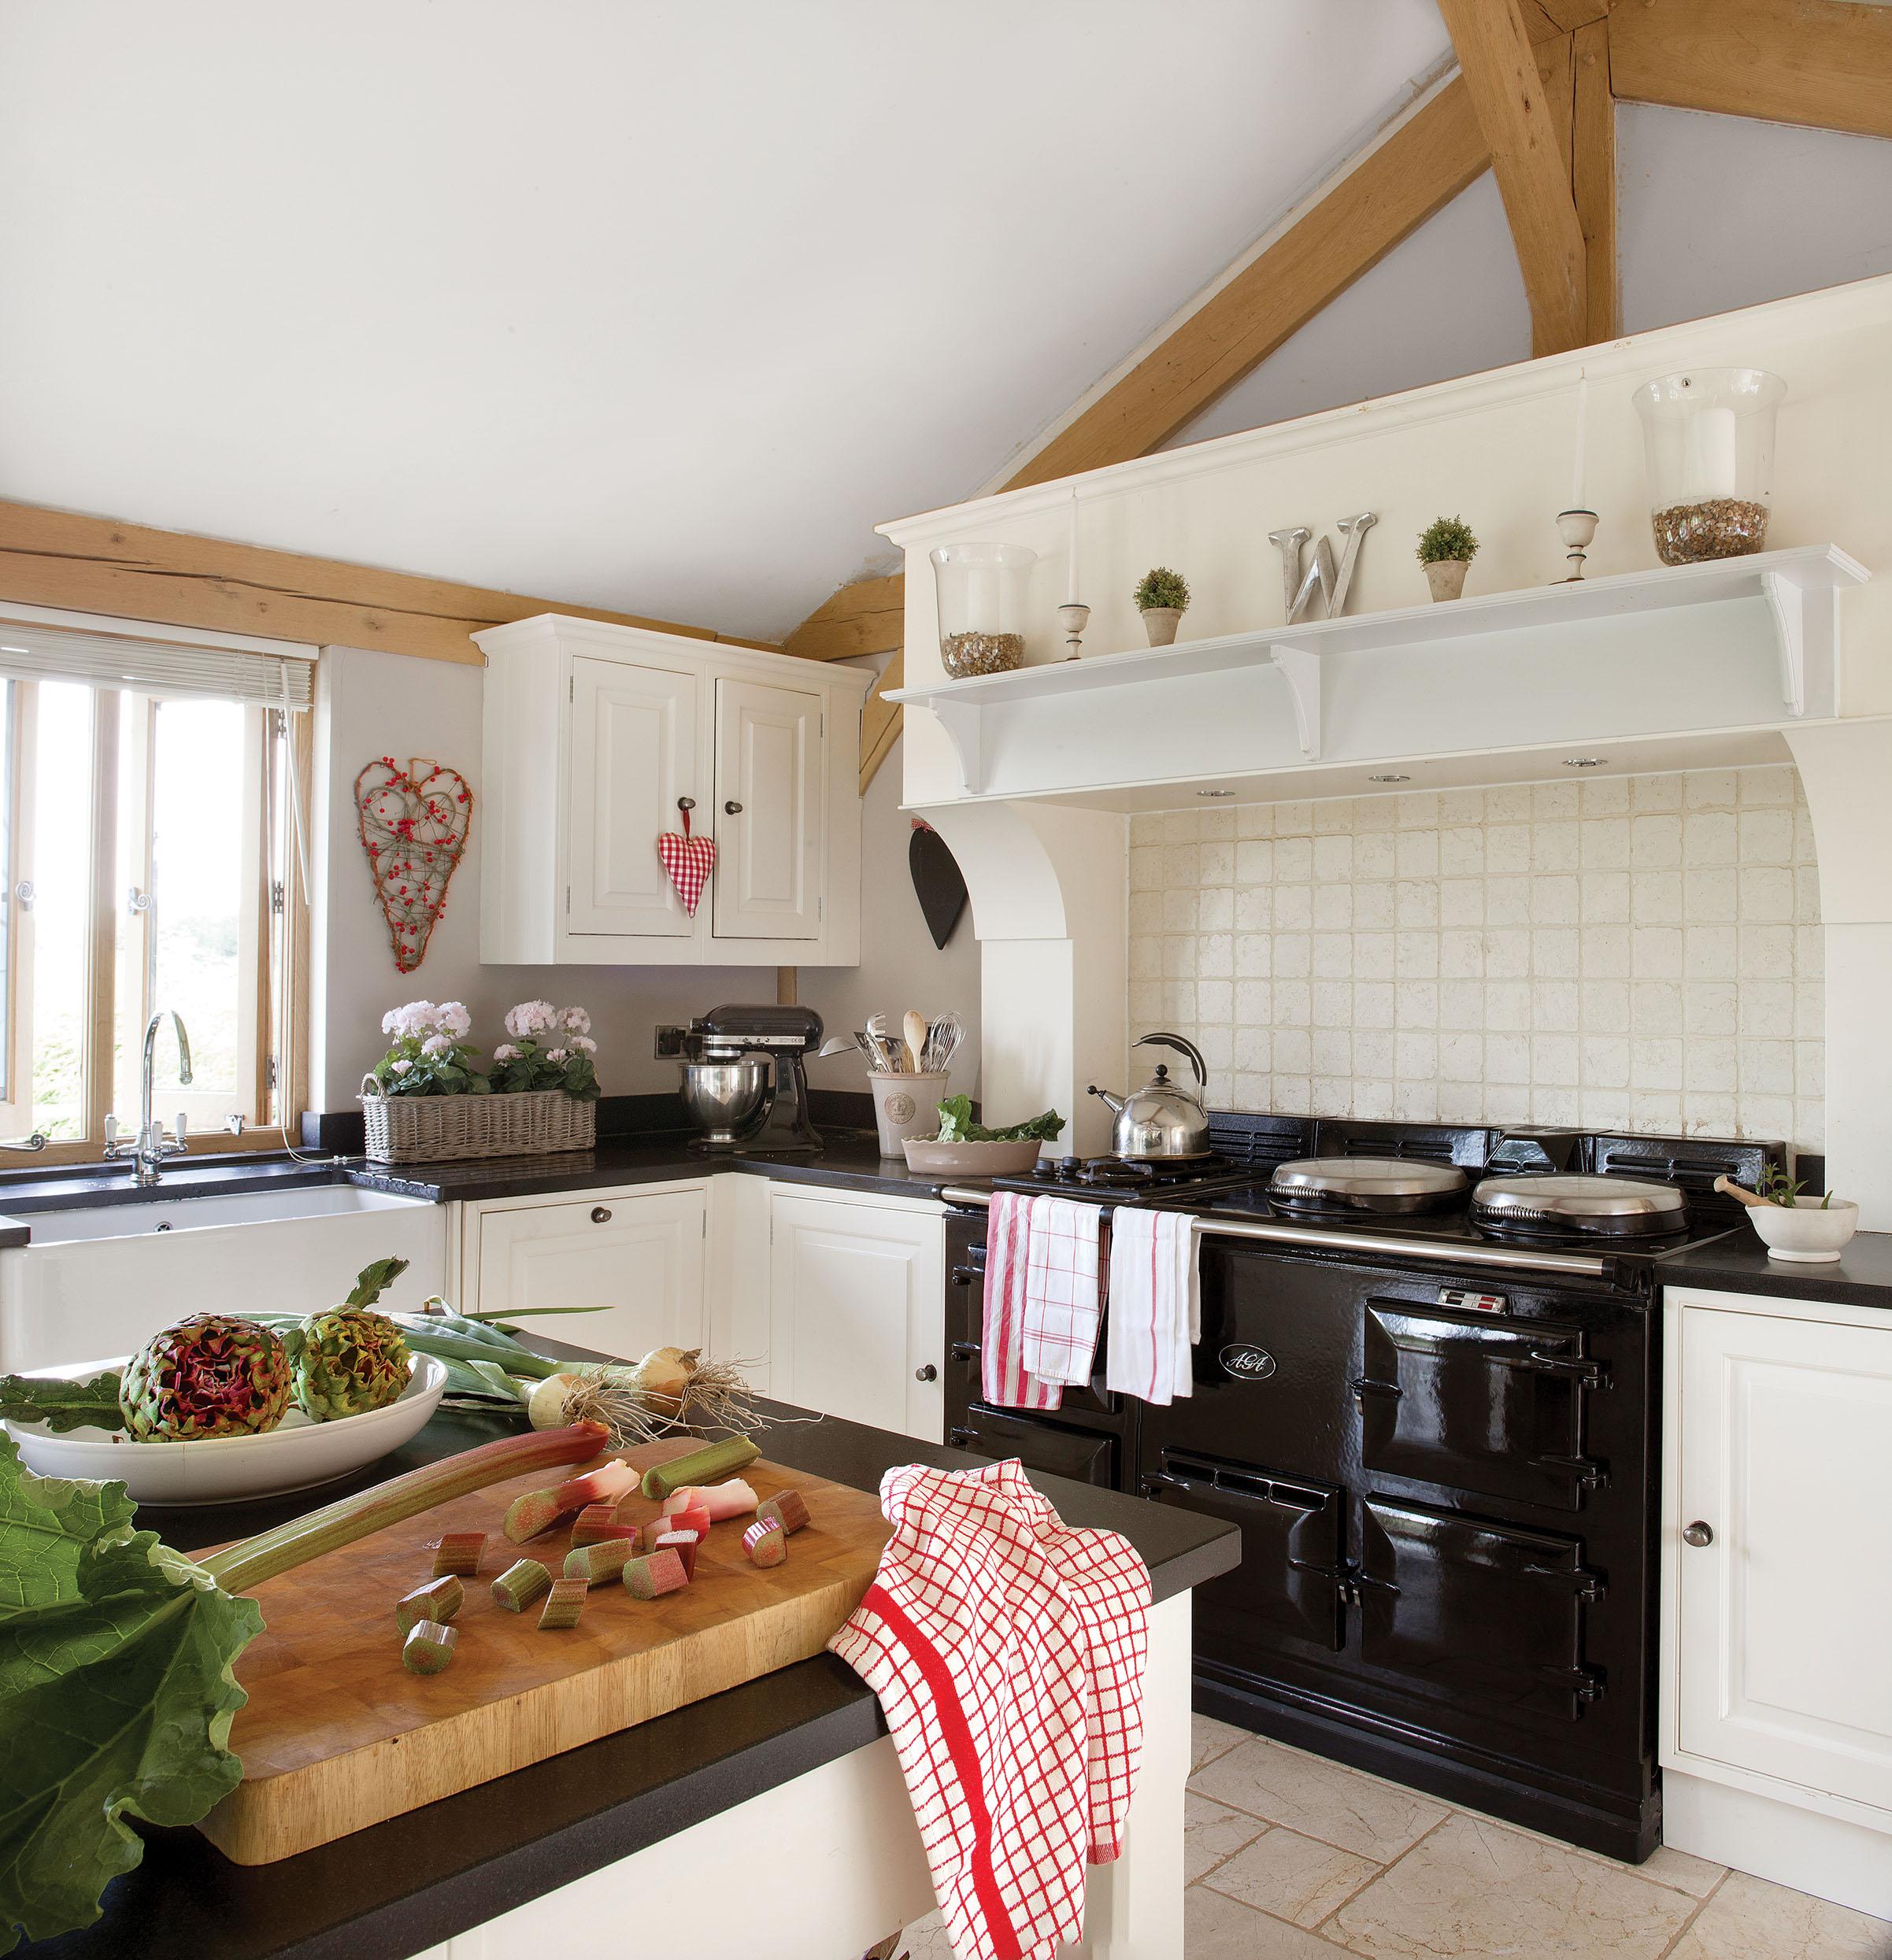 белая кухня плита вытяжка плитка